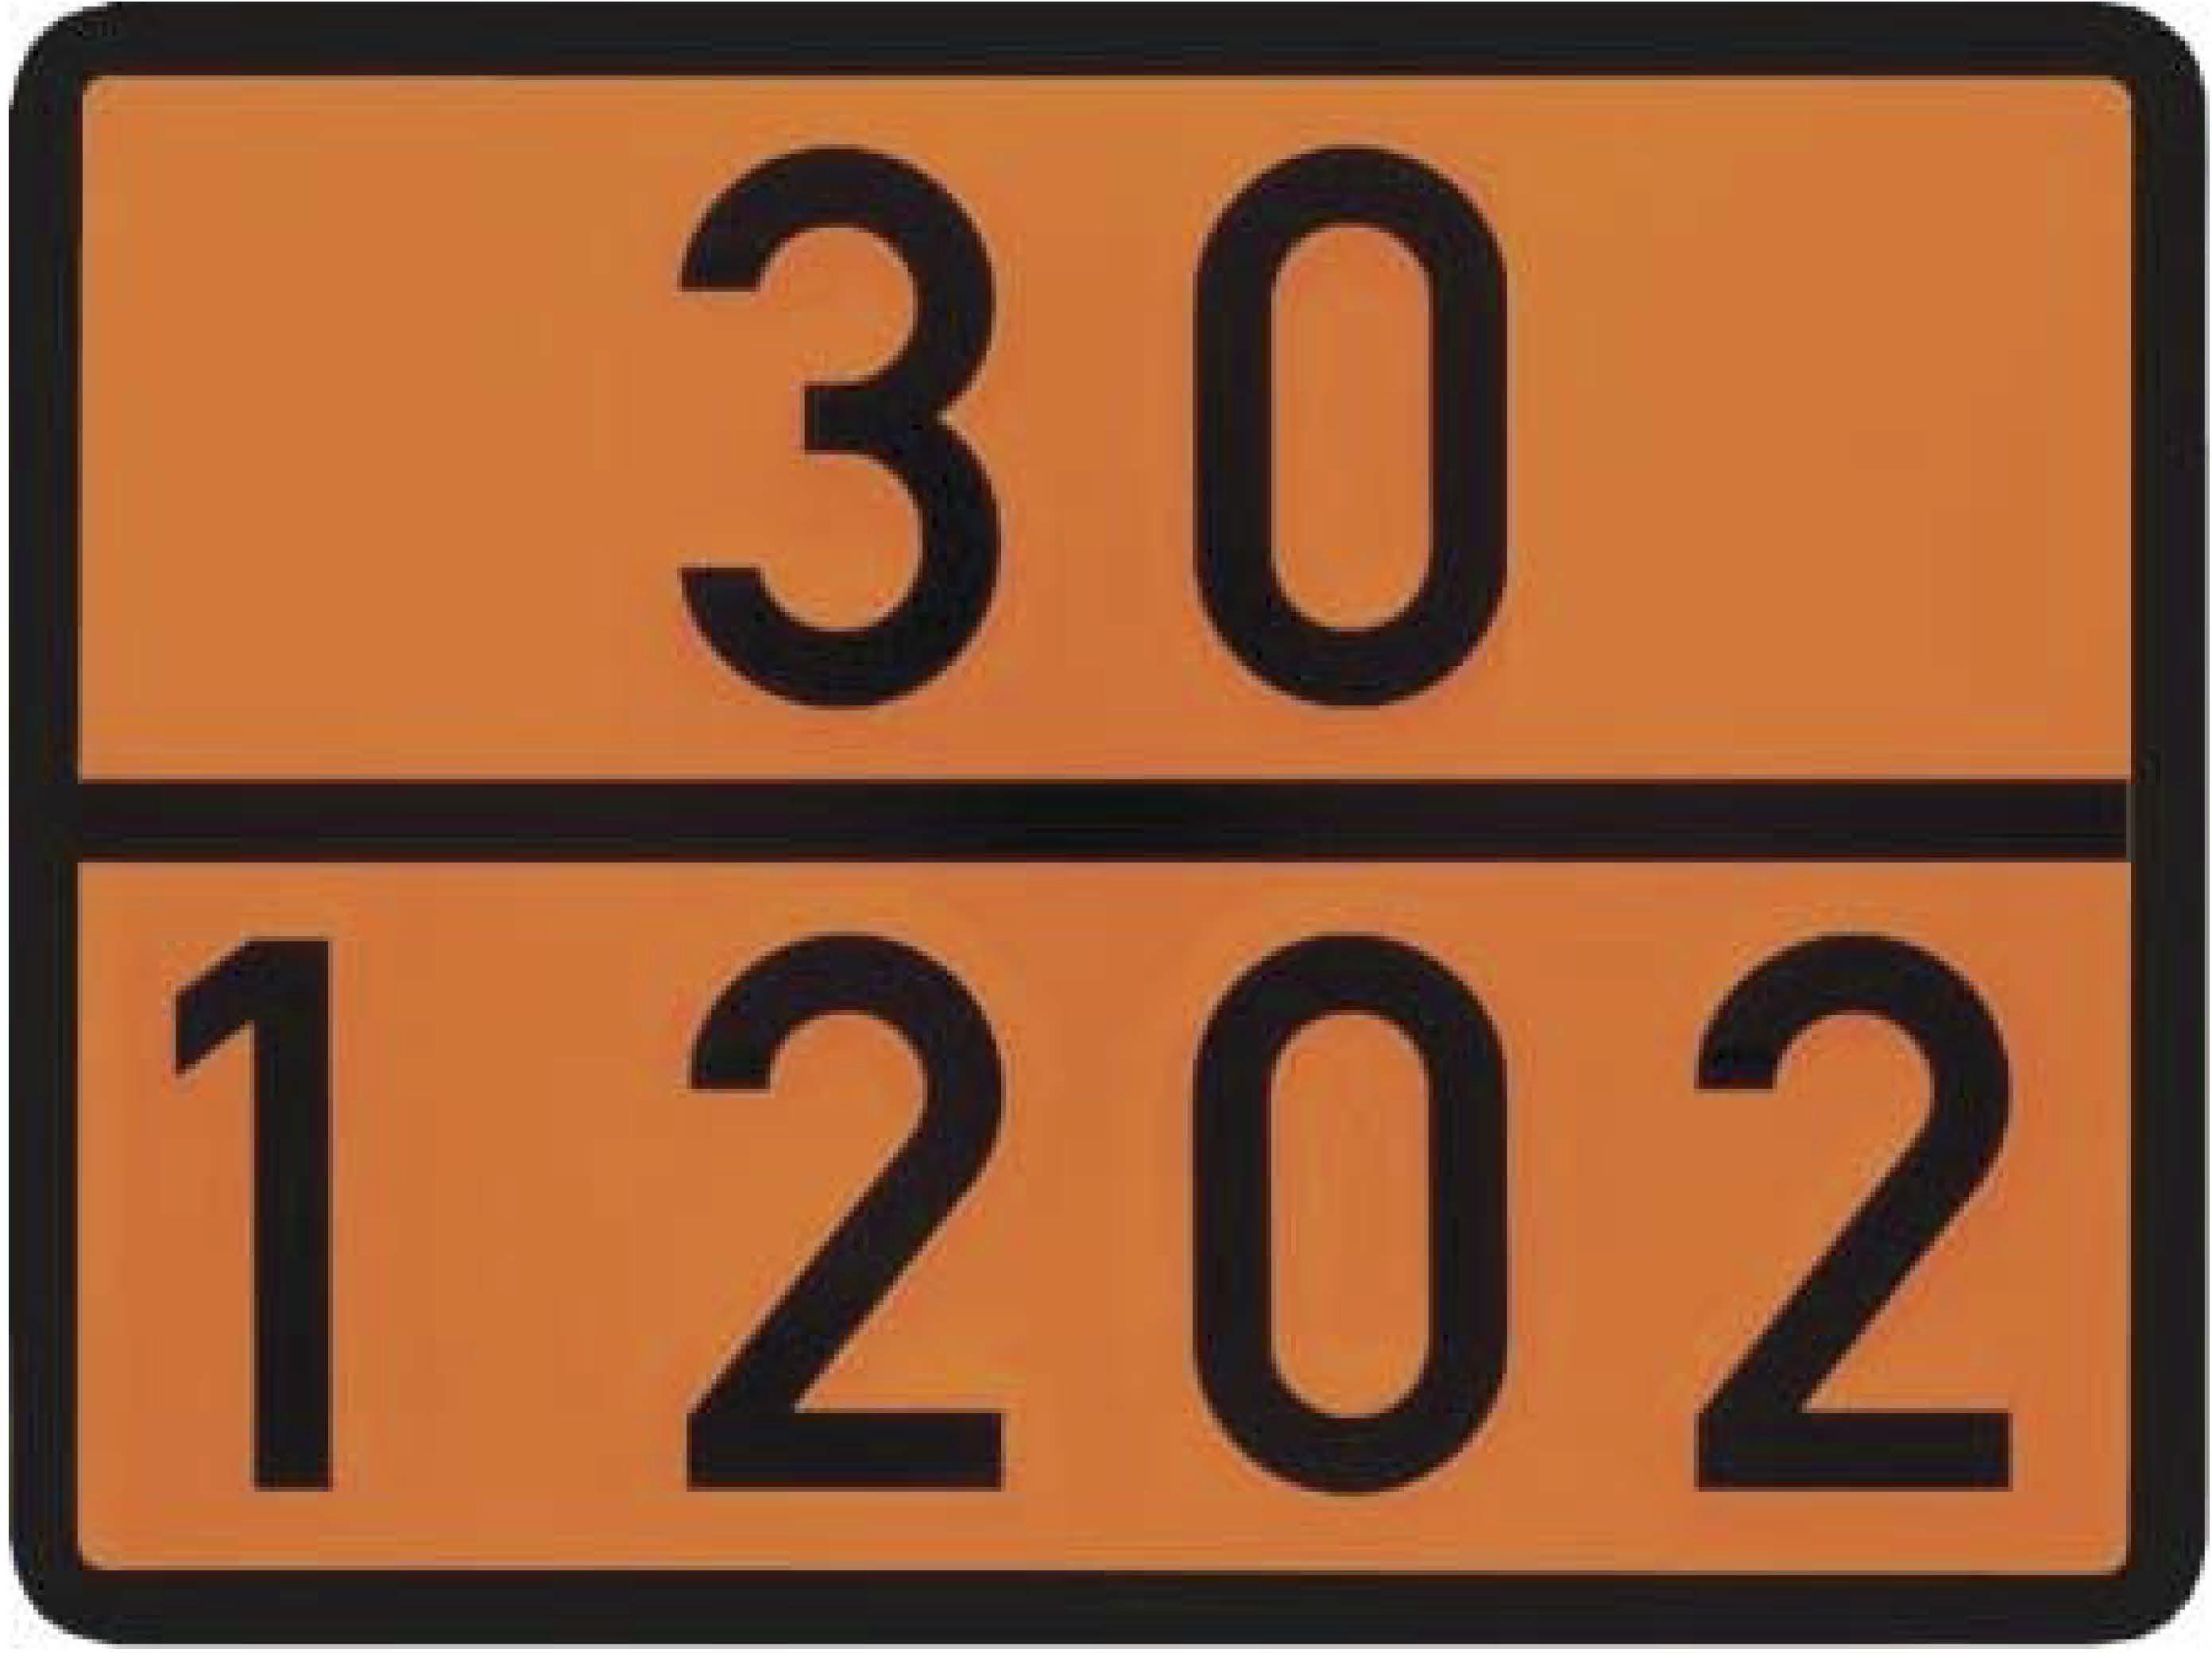 bottari-v11-placa-v11-mercancias-peligrosas